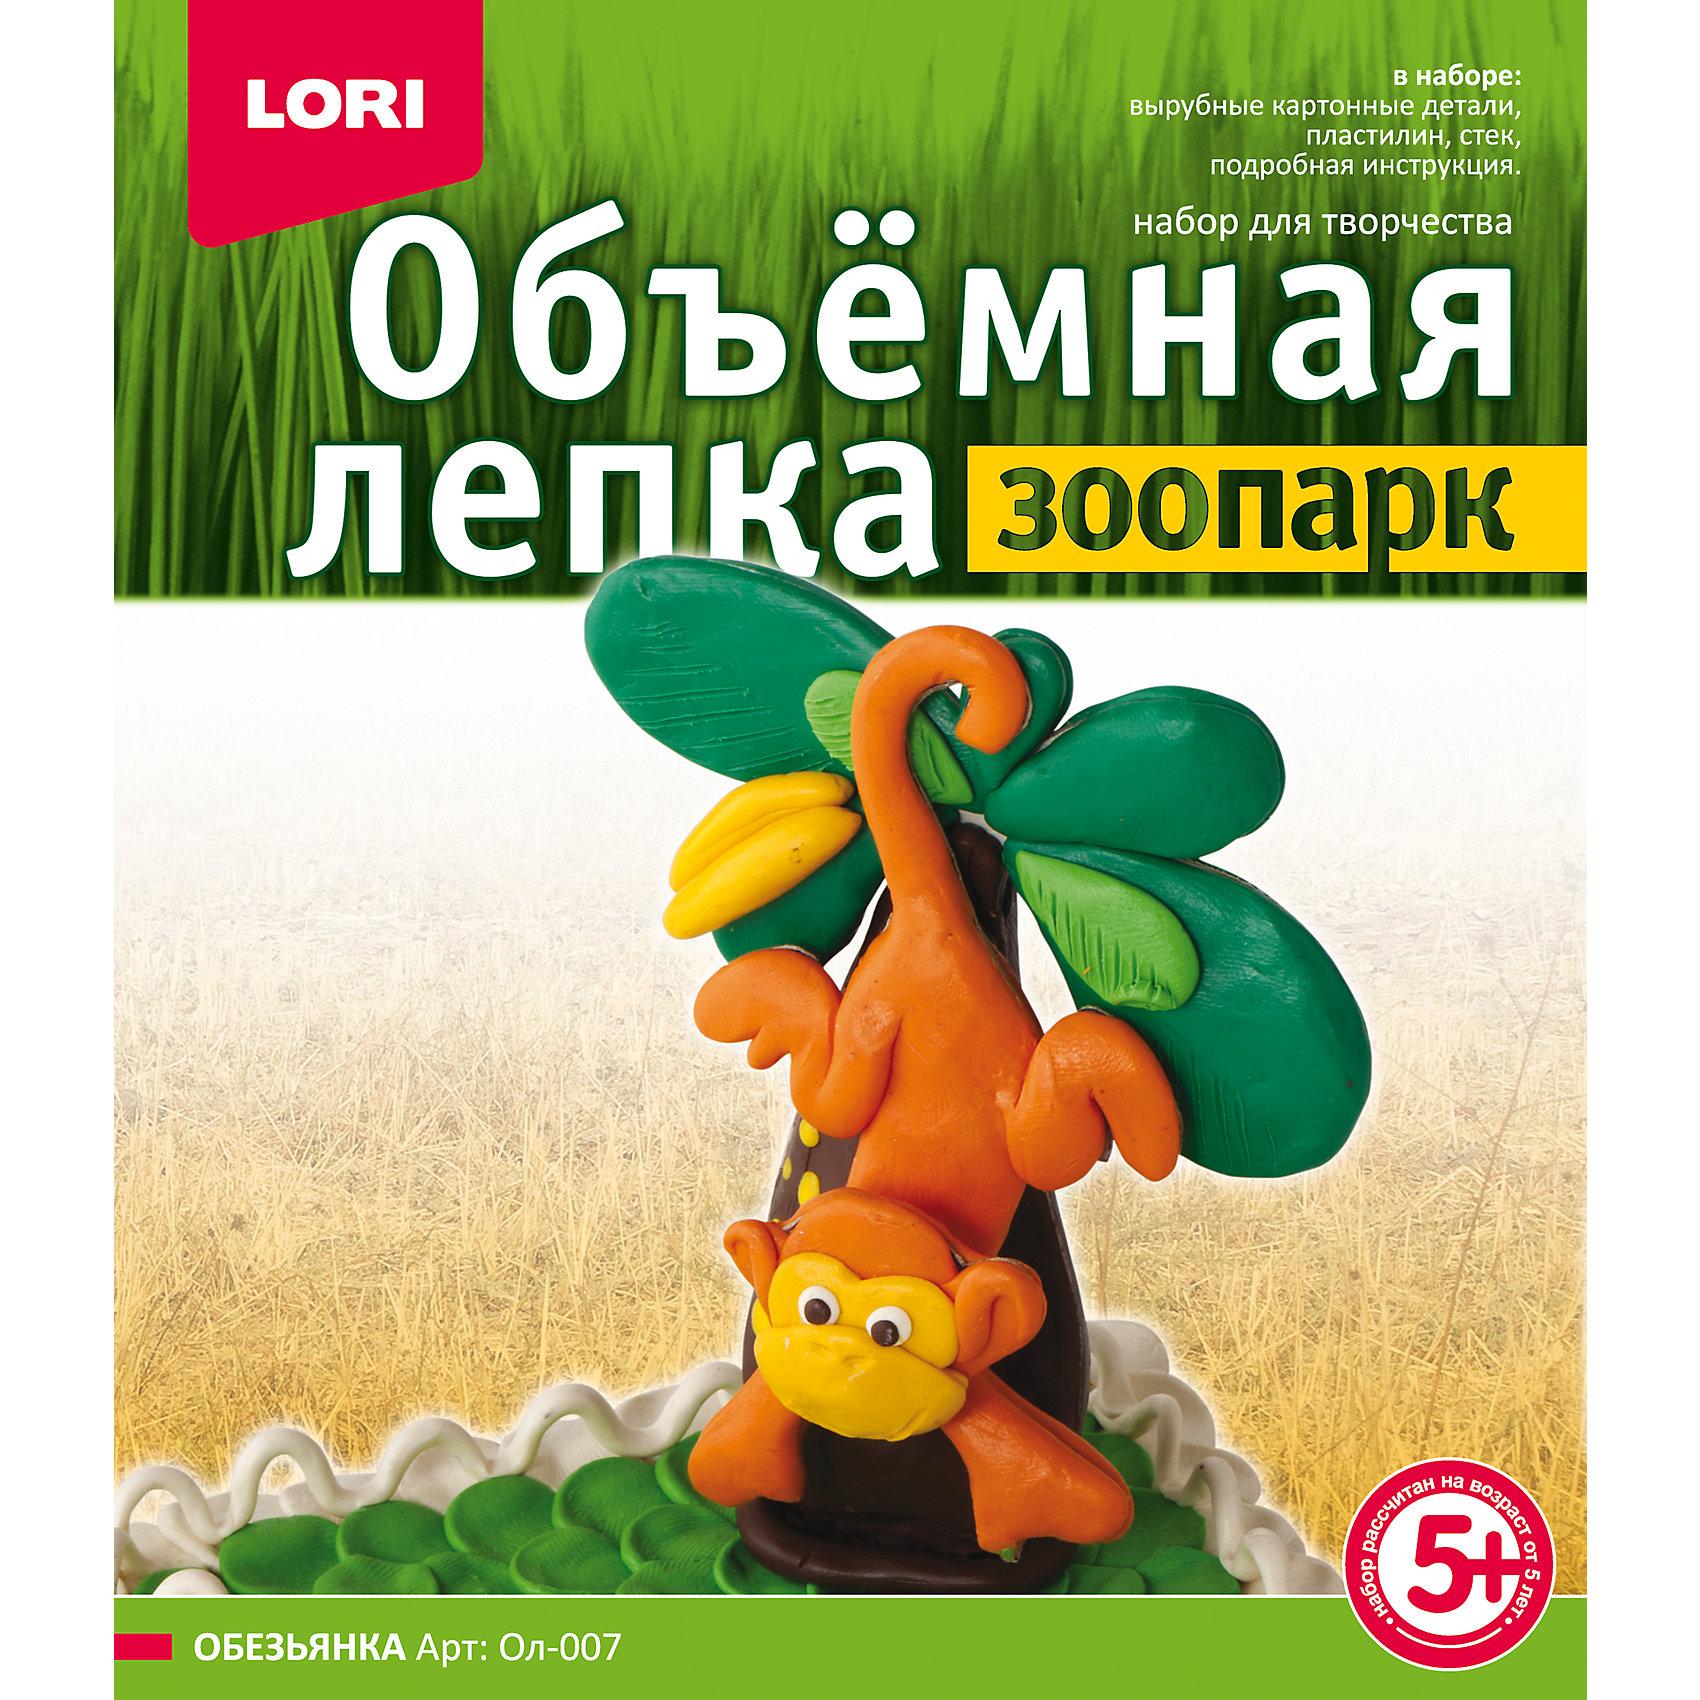 LORI Лепка объемная Зоопарк Обезьянка пластилин lori принцессы 12 цветов